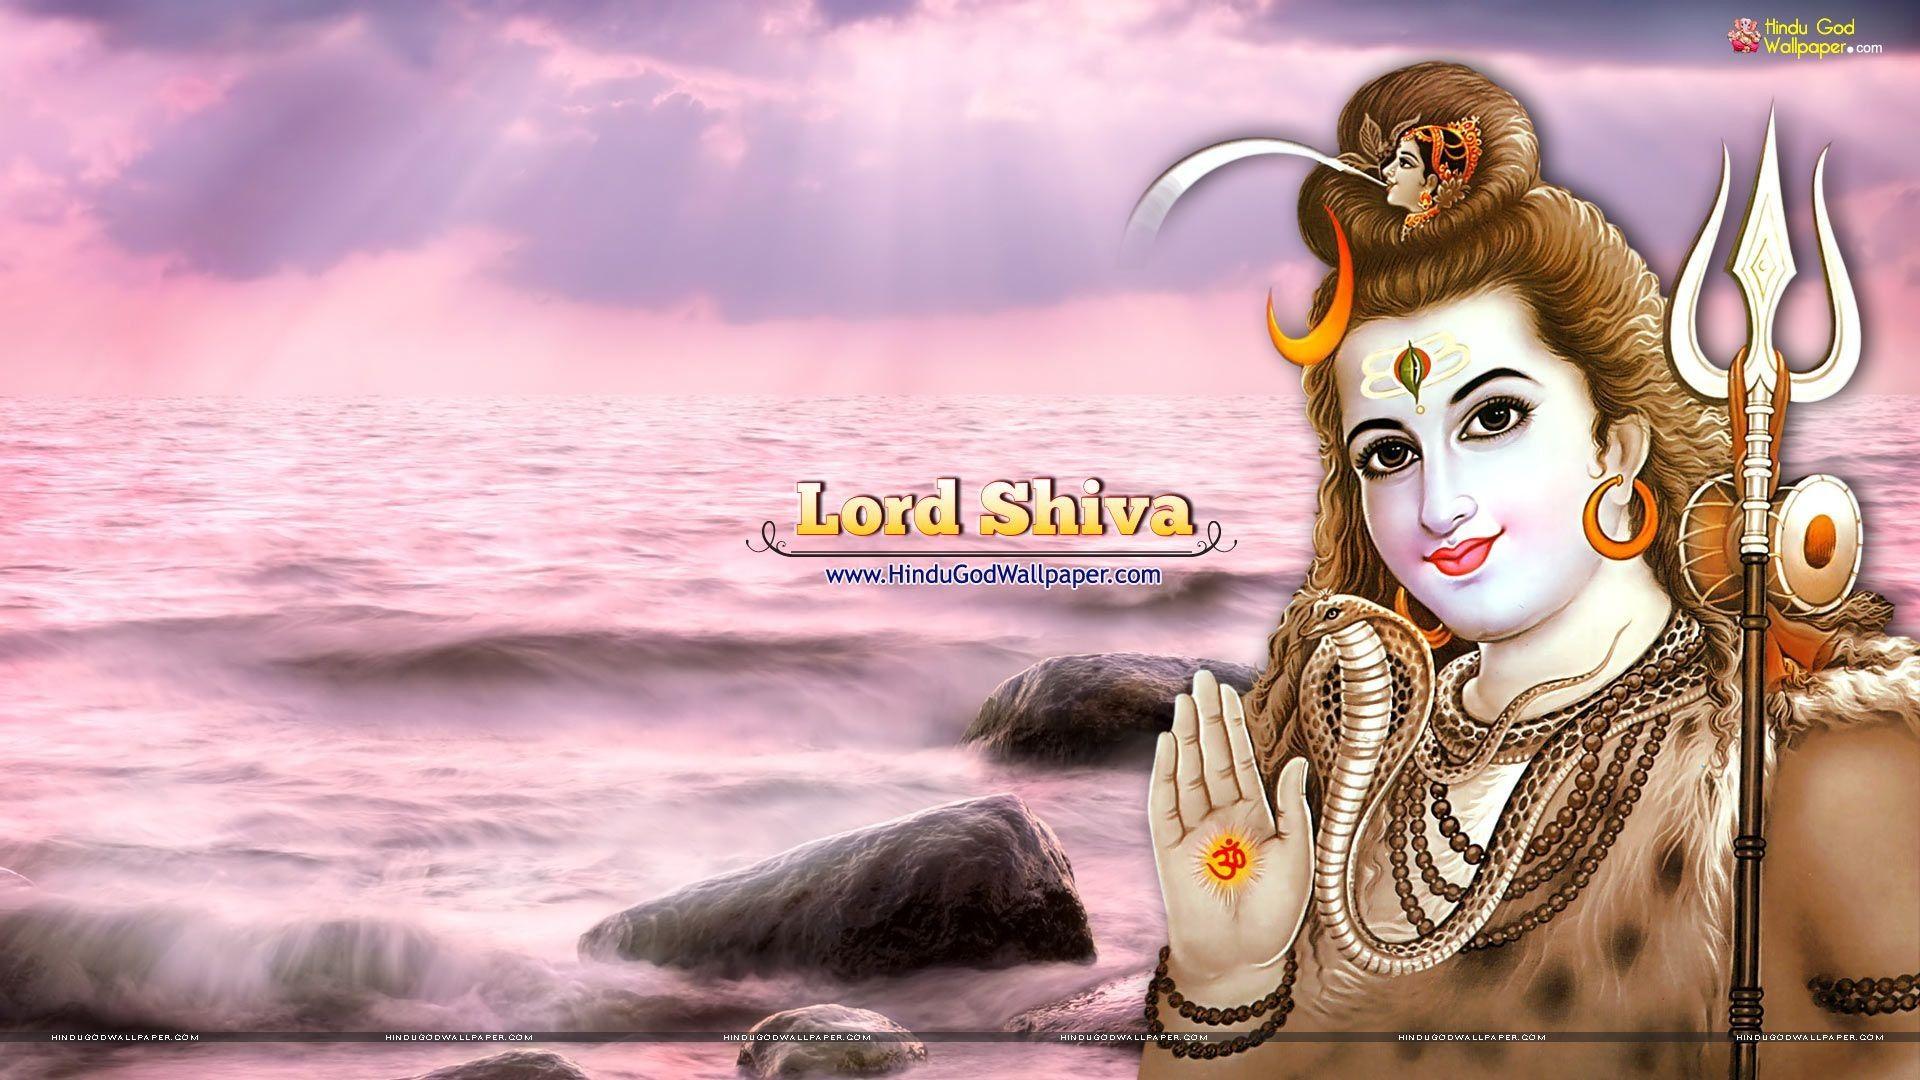 Elegant God Images Full Size Lord Shiva Hd Wallpaper Shiva Wallpaper Shiva